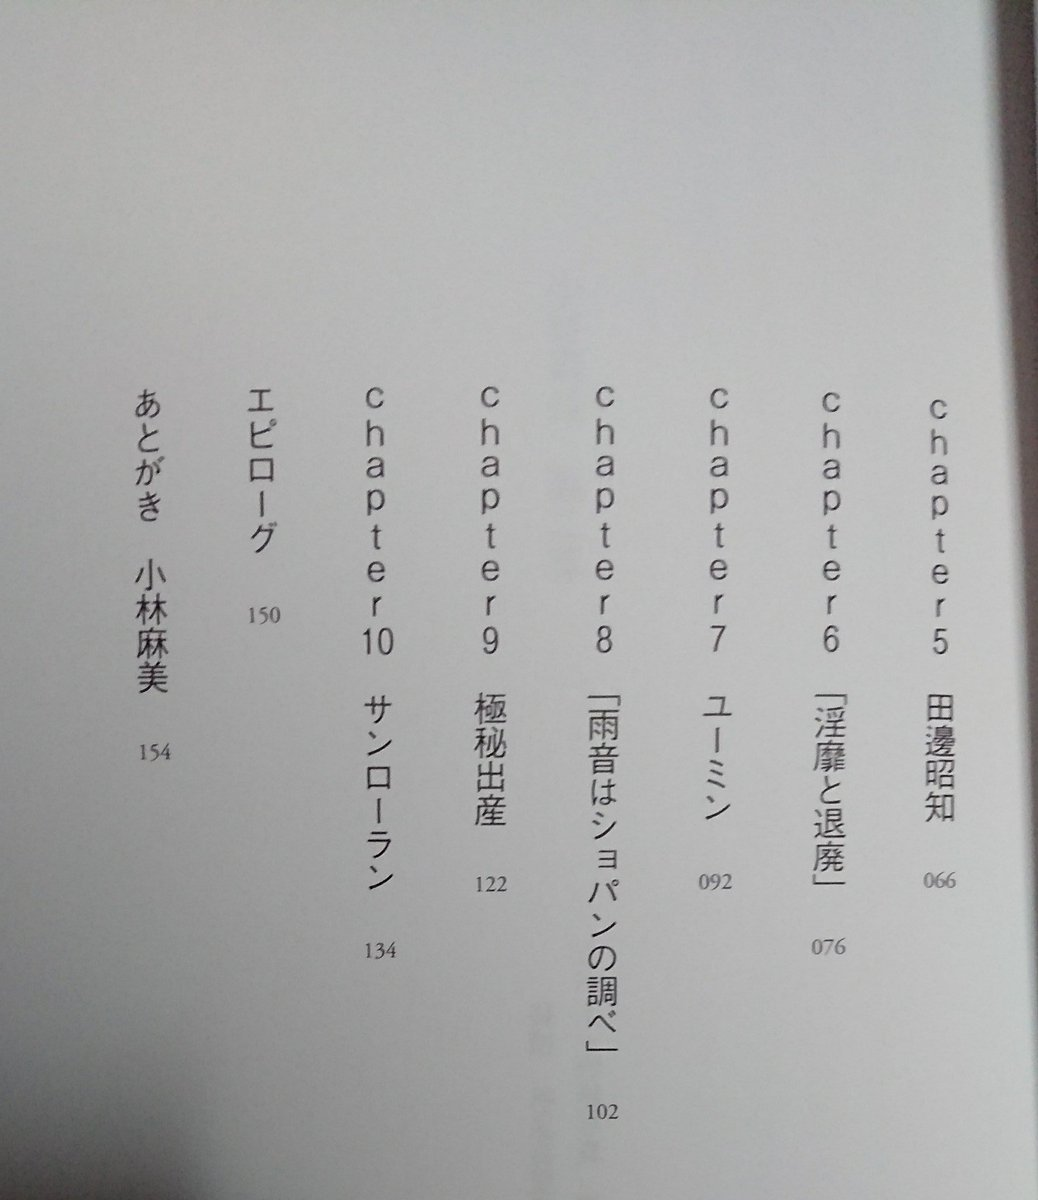 test ツイッターメディア - 『小林麻美 第二幕』(延江浩 著, 朝日新聞出版):明日の外出を控えるため、仕事帰りに紀伊国屋書店で買い物。この表紙と帯にあるユーミンの推薦文で即決で購入。 https://t.co/EfiCmp1HPy